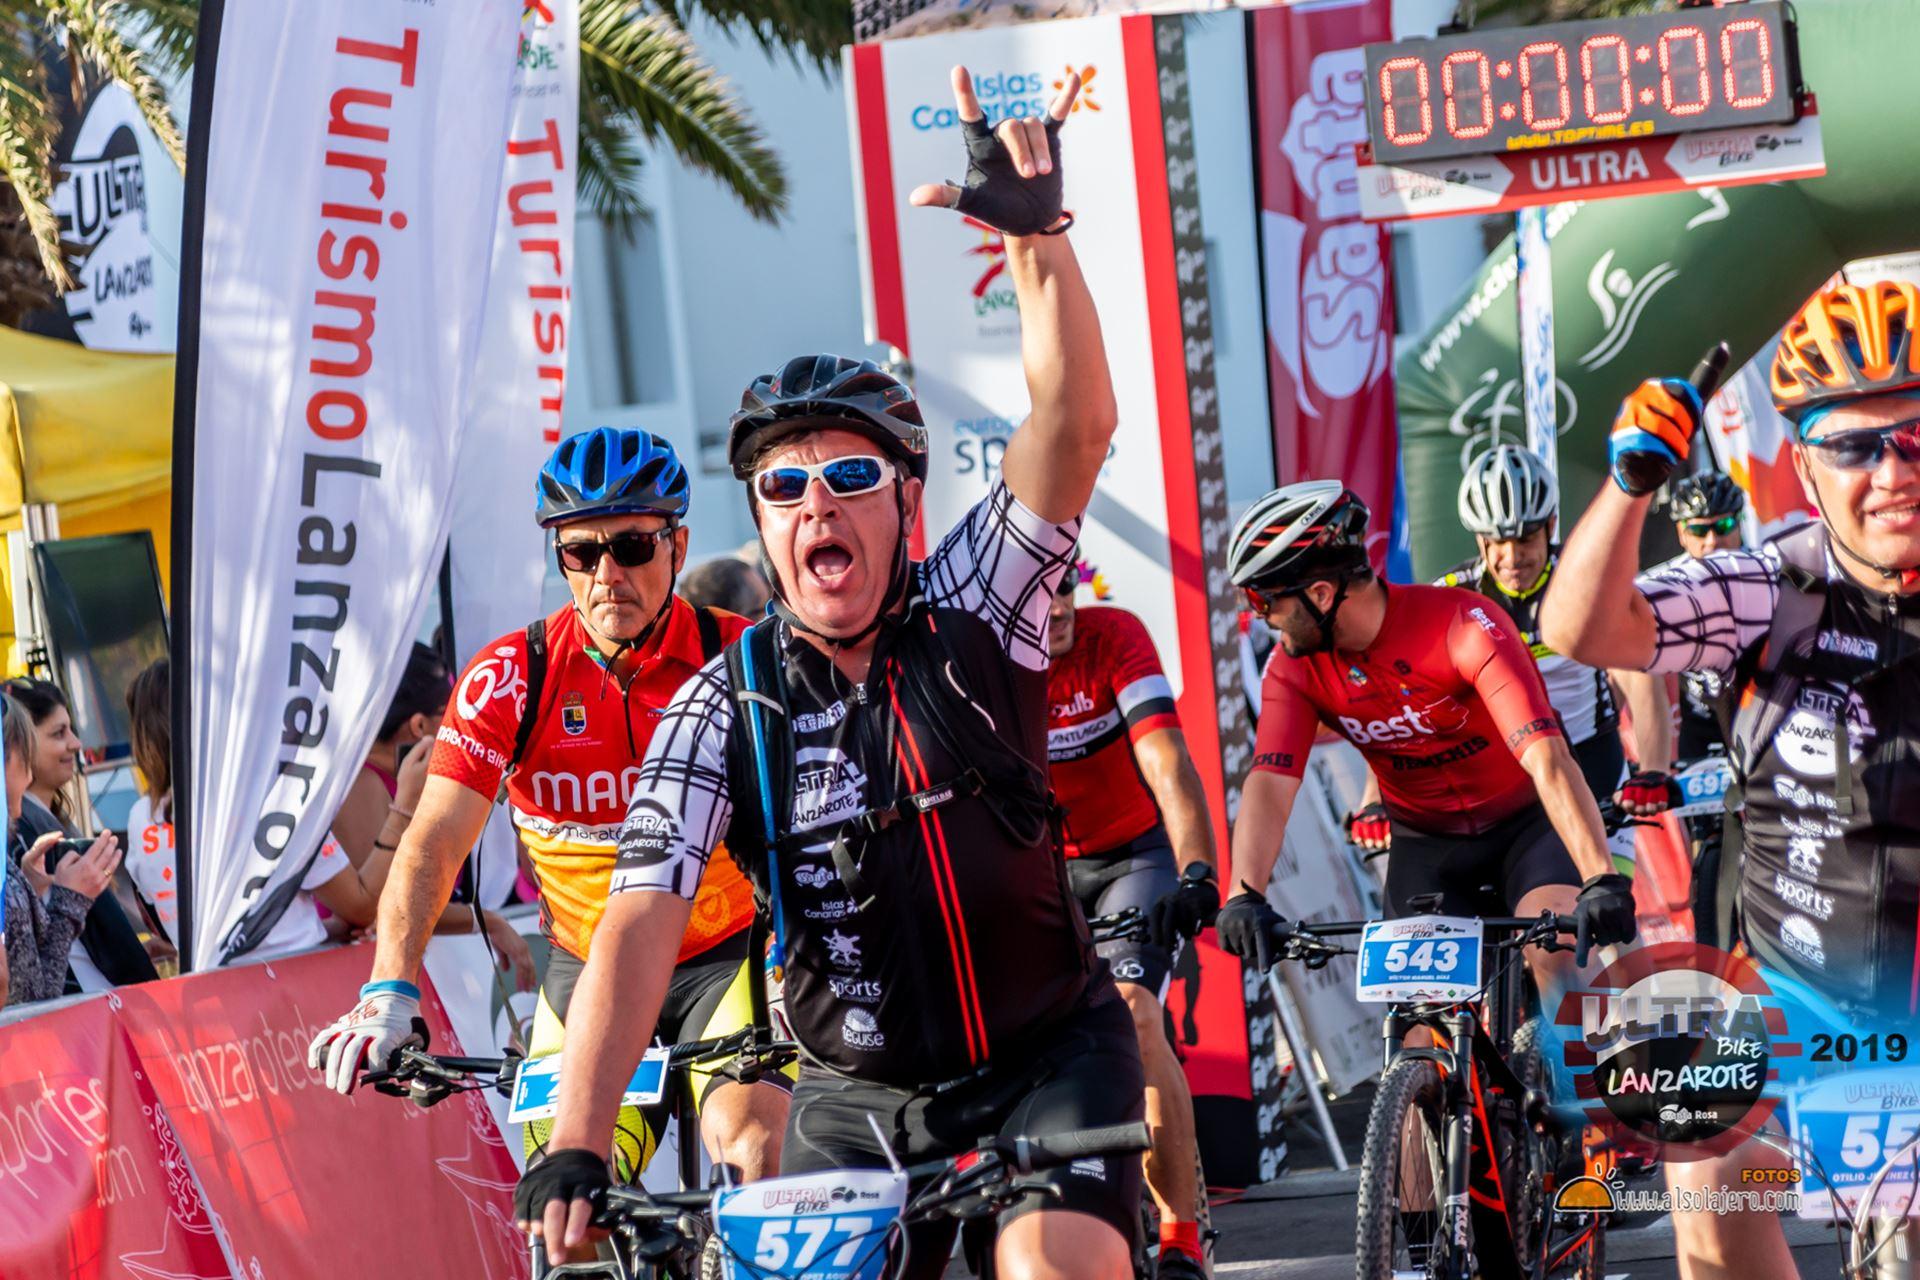 Salida 2ª Etapa Ultrabike 2019 Fotos Alsolajero.com-69